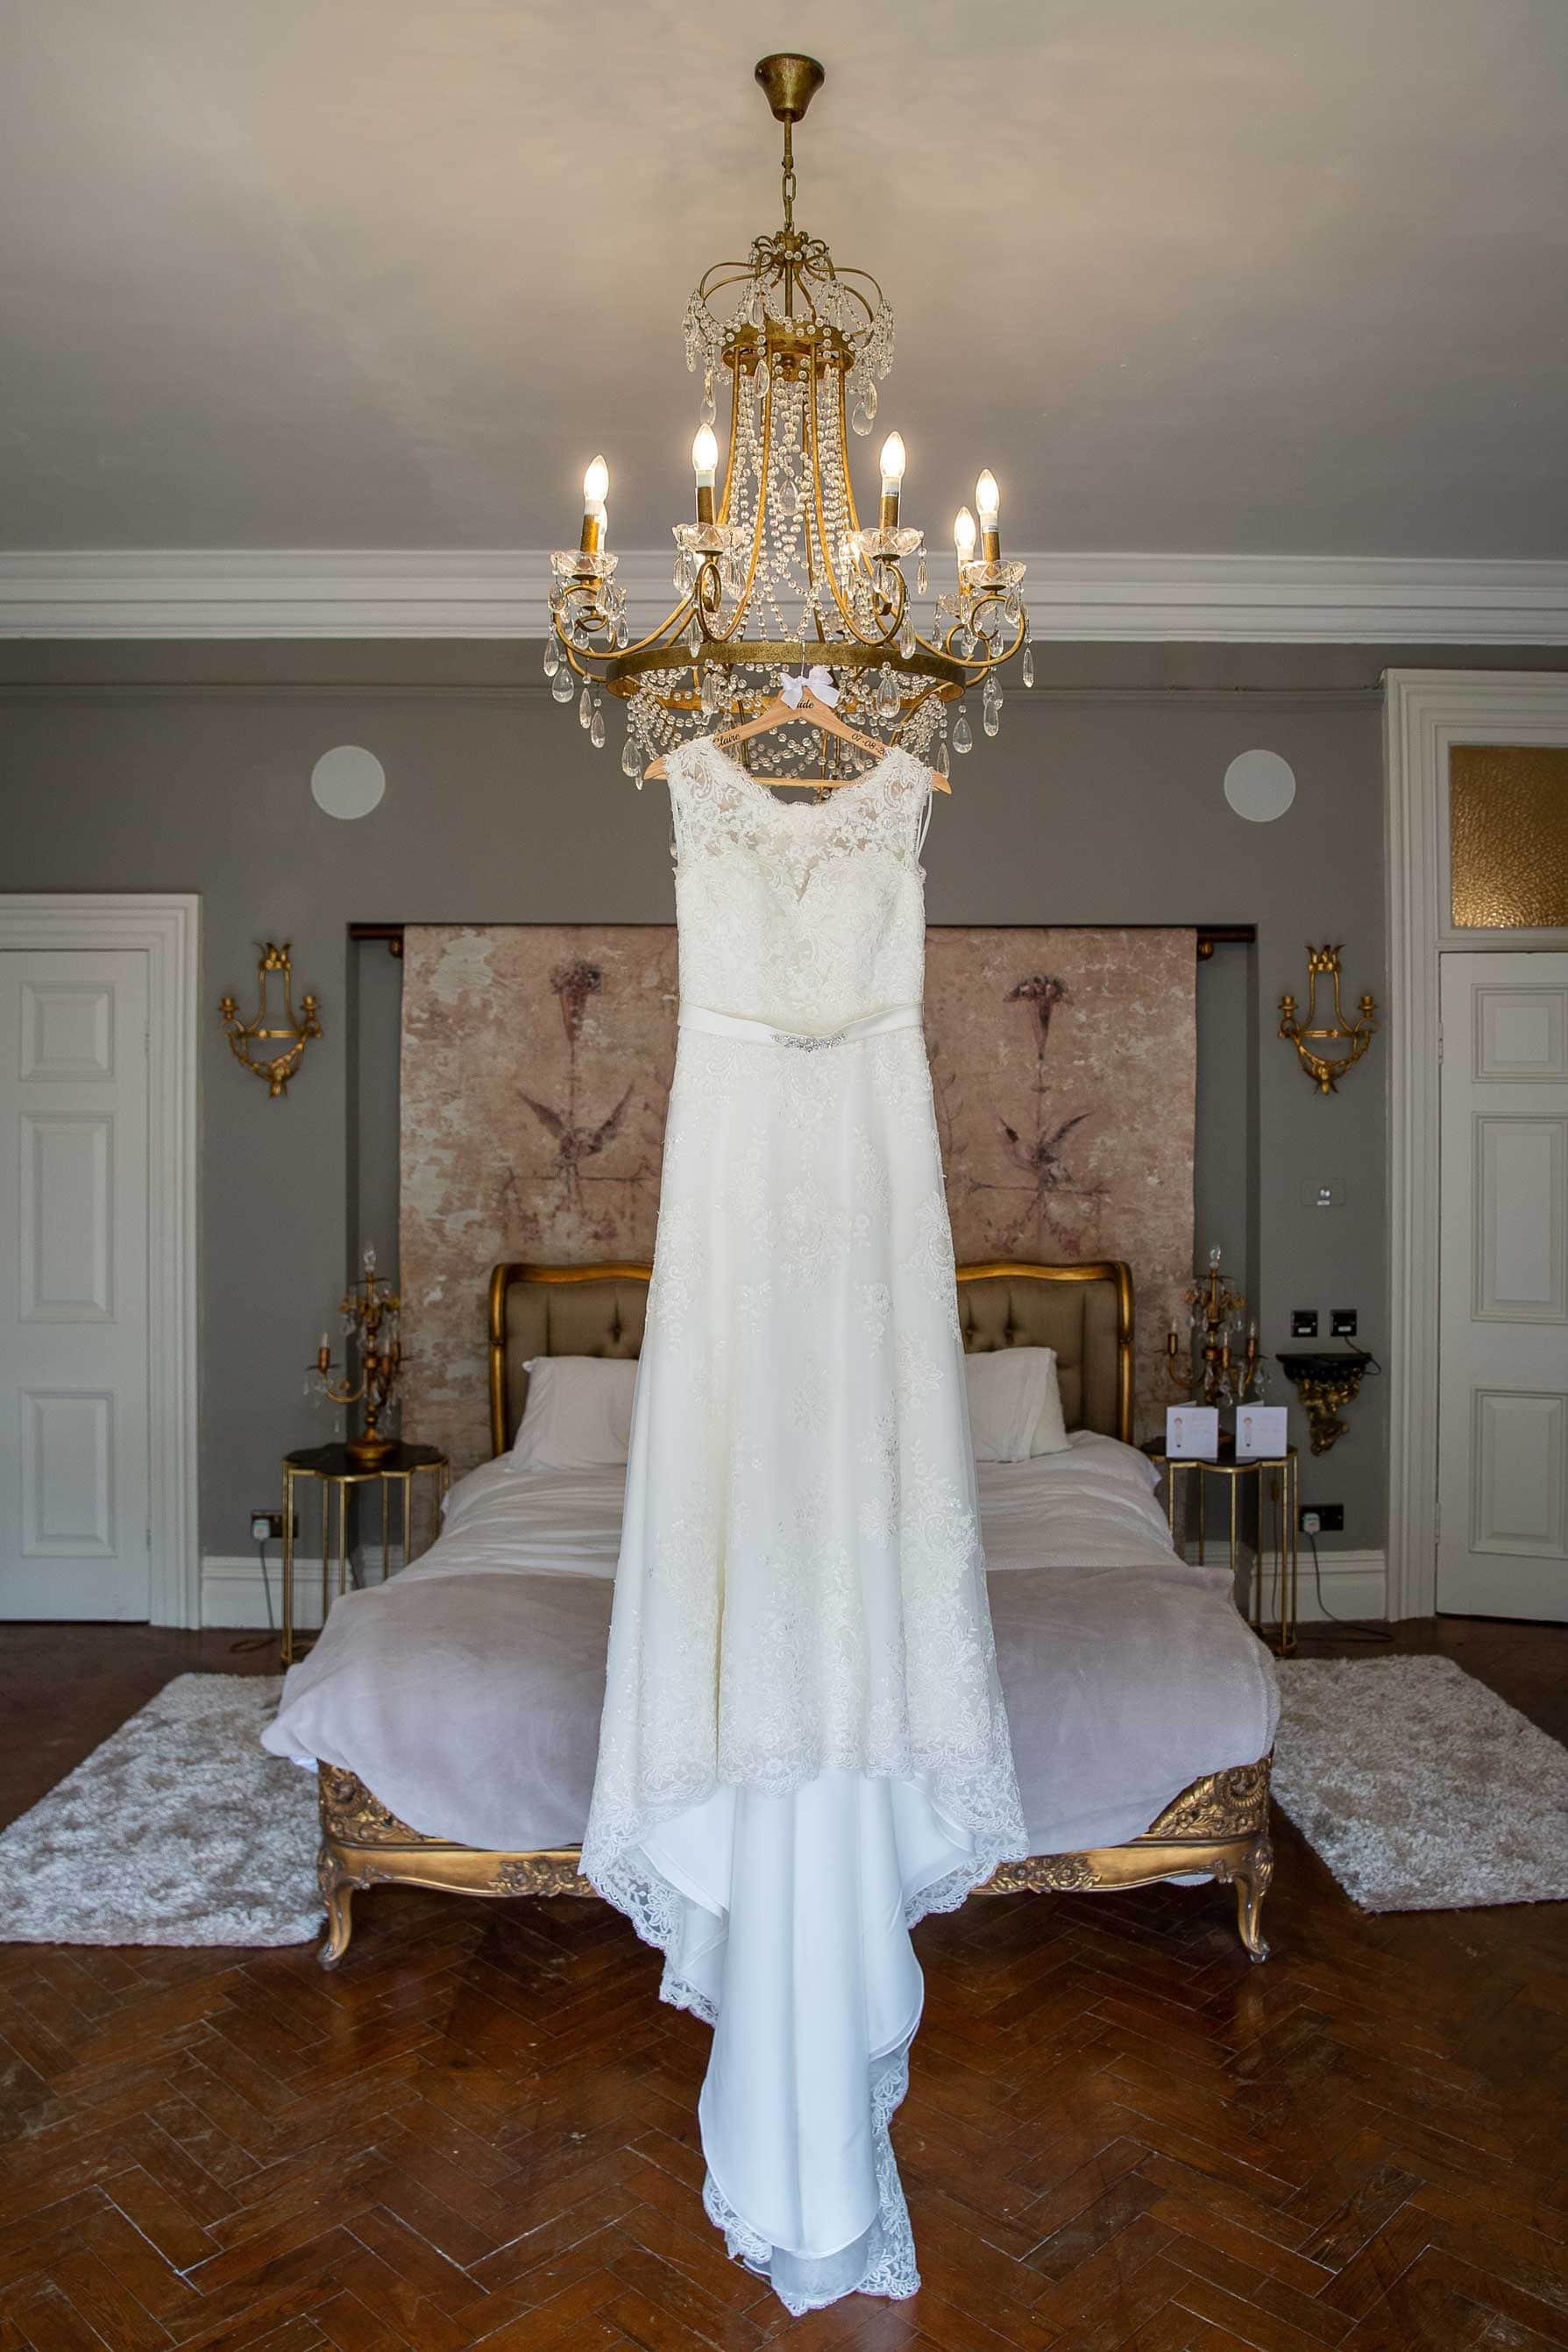 Wedding dress hanging up in Ellingham hall